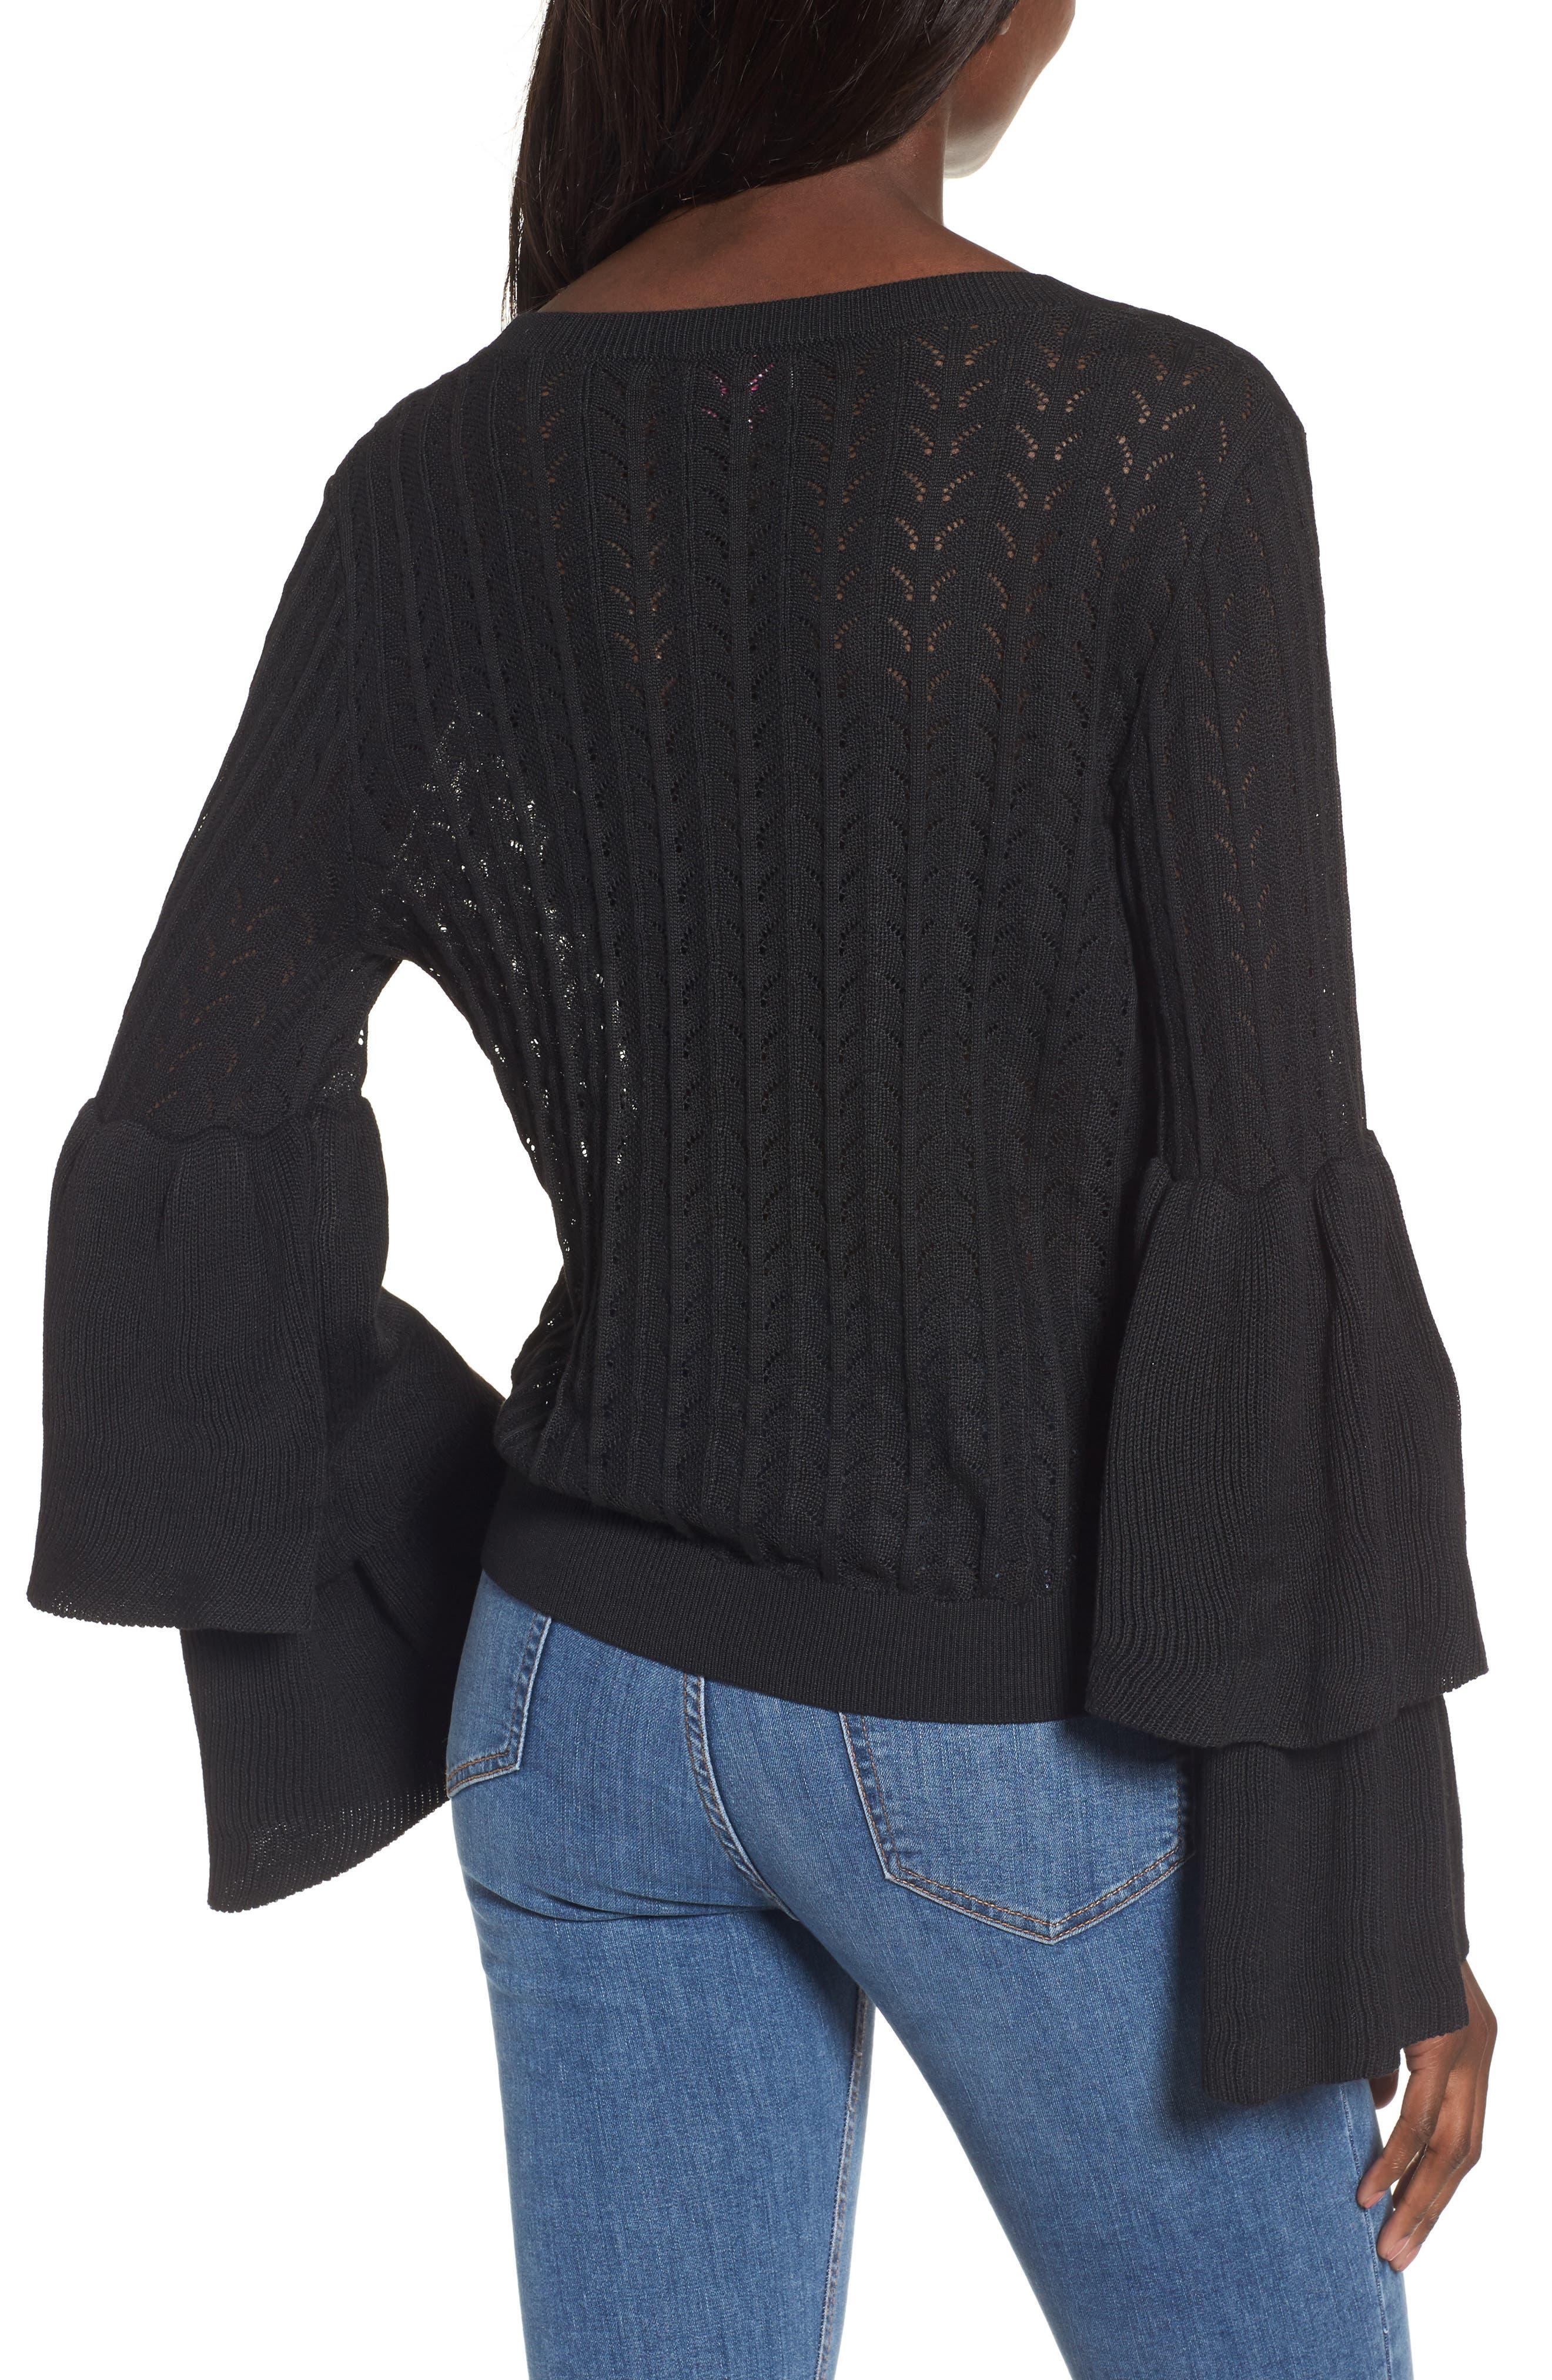 Molly Ruffle Sweater,                             Alternate thumbnail 2, color,                             001